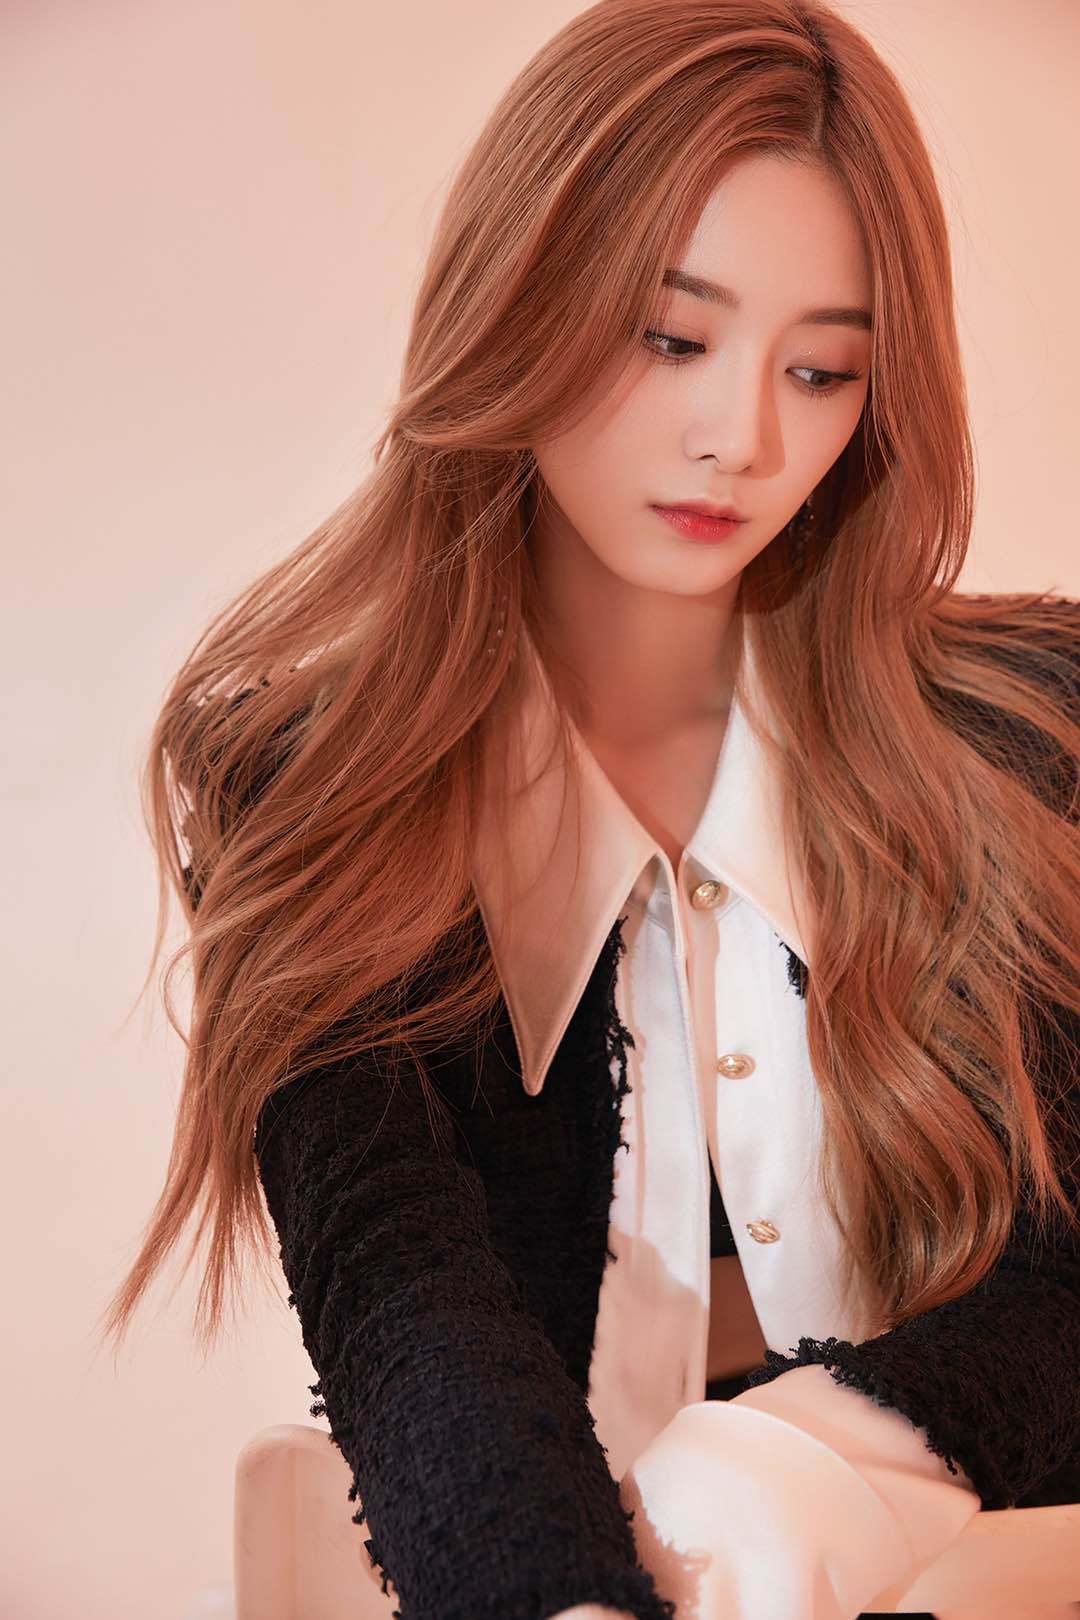 Yiyang